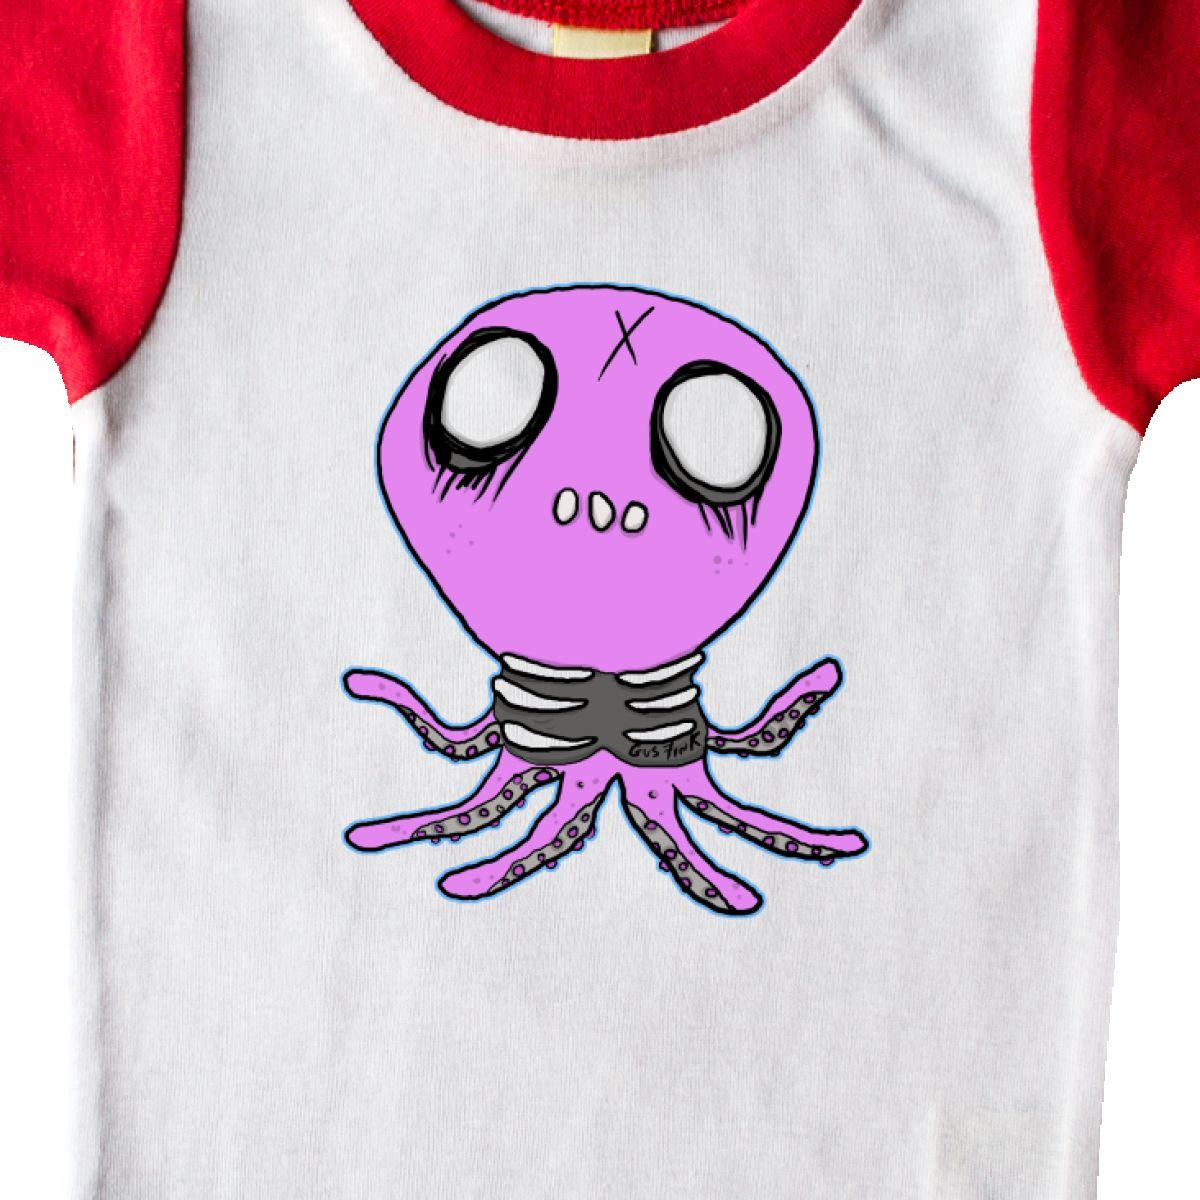 Inktastic Death Metal Octopus Infant Creeper T-shirt Skeleton Horror Goth Nerd